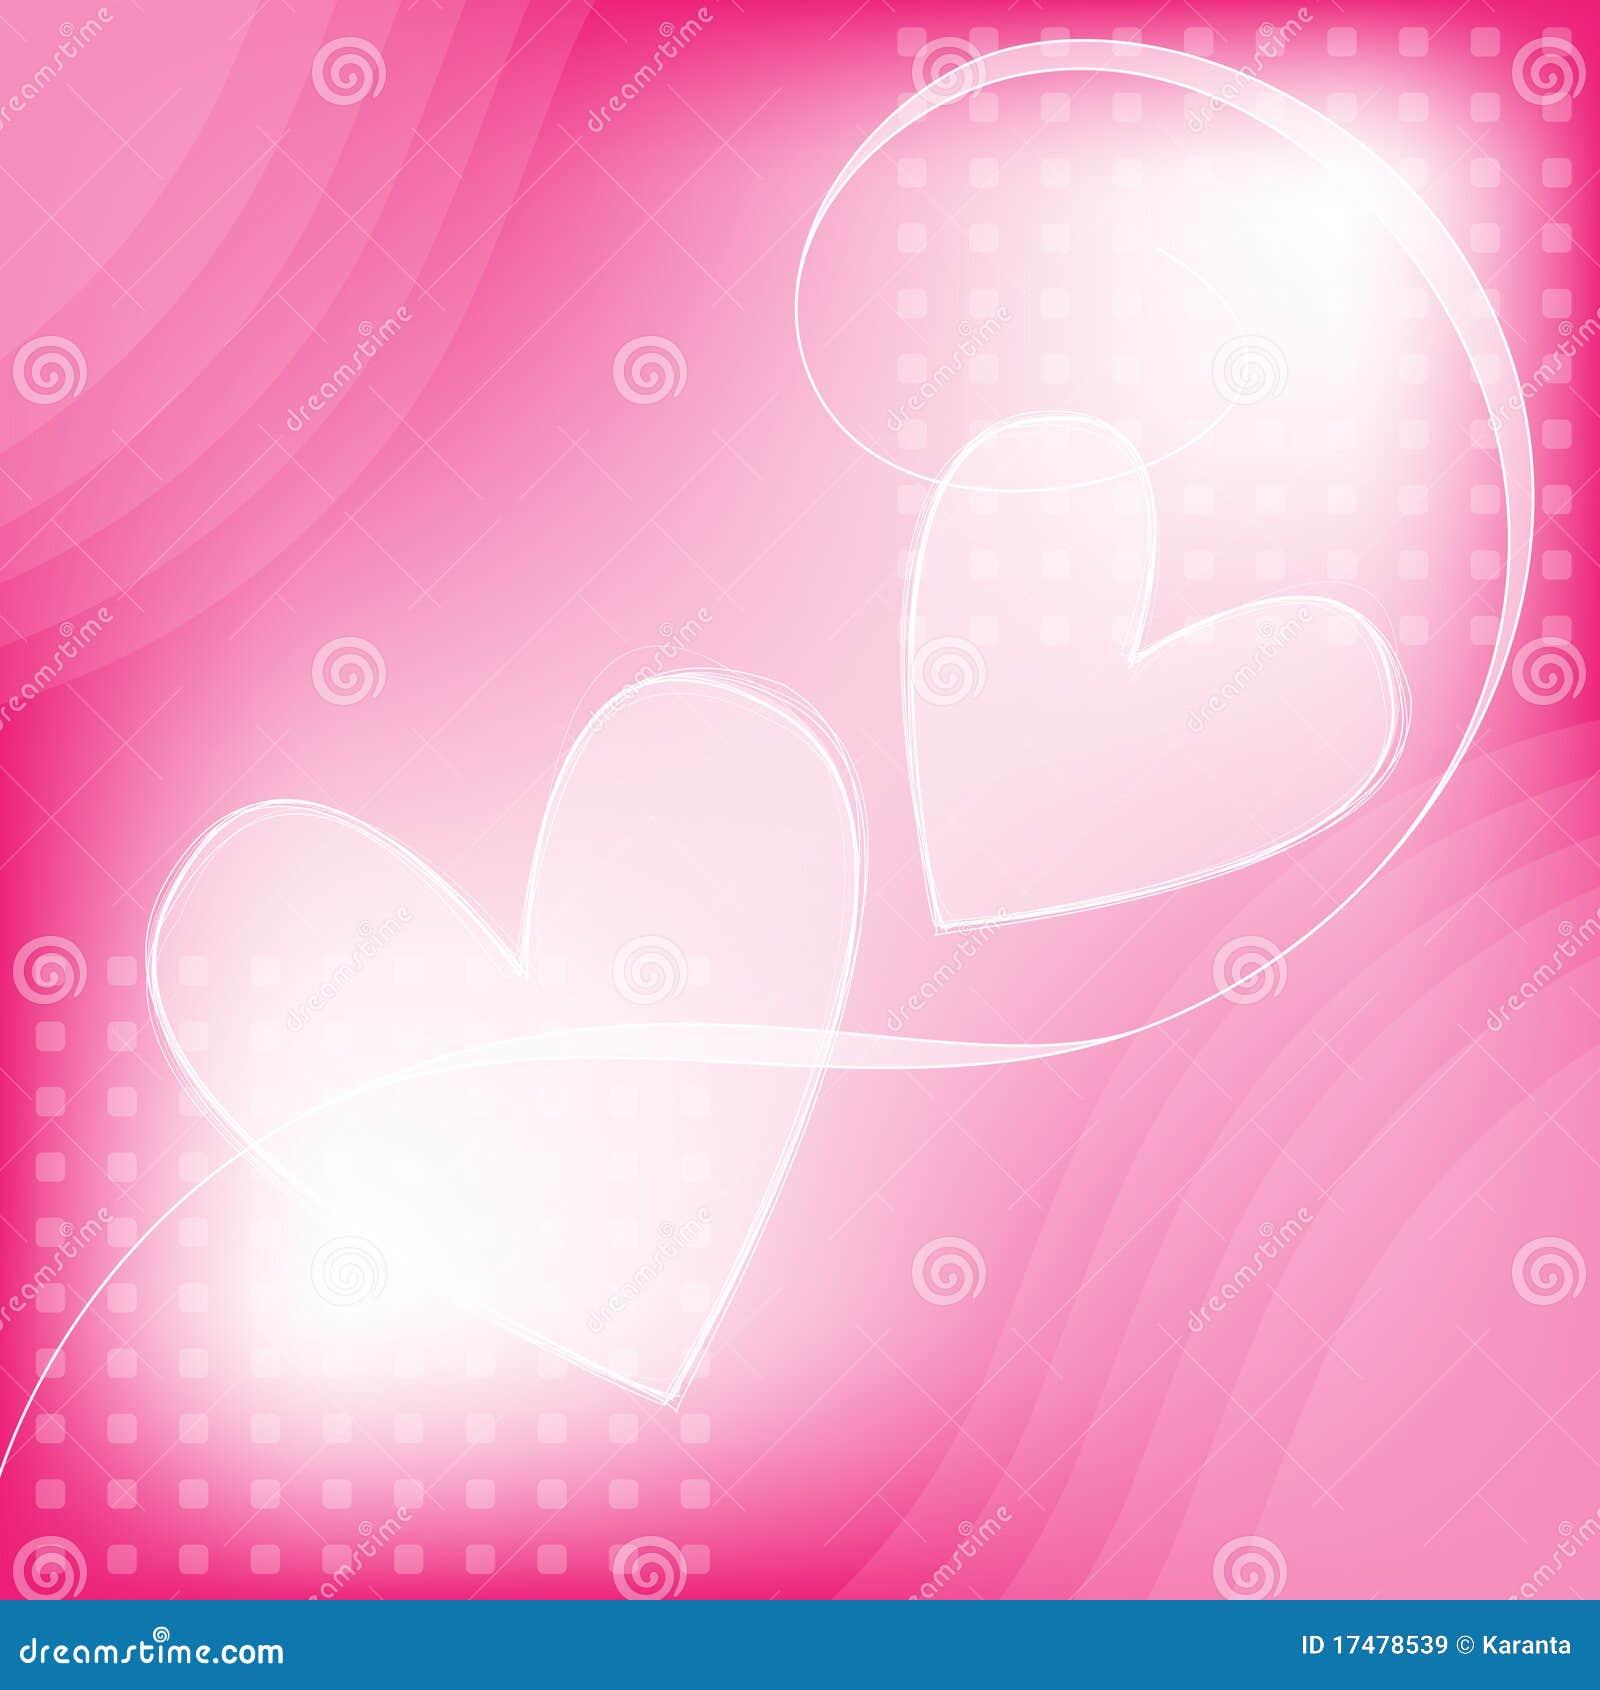 Pink And White Romanti...